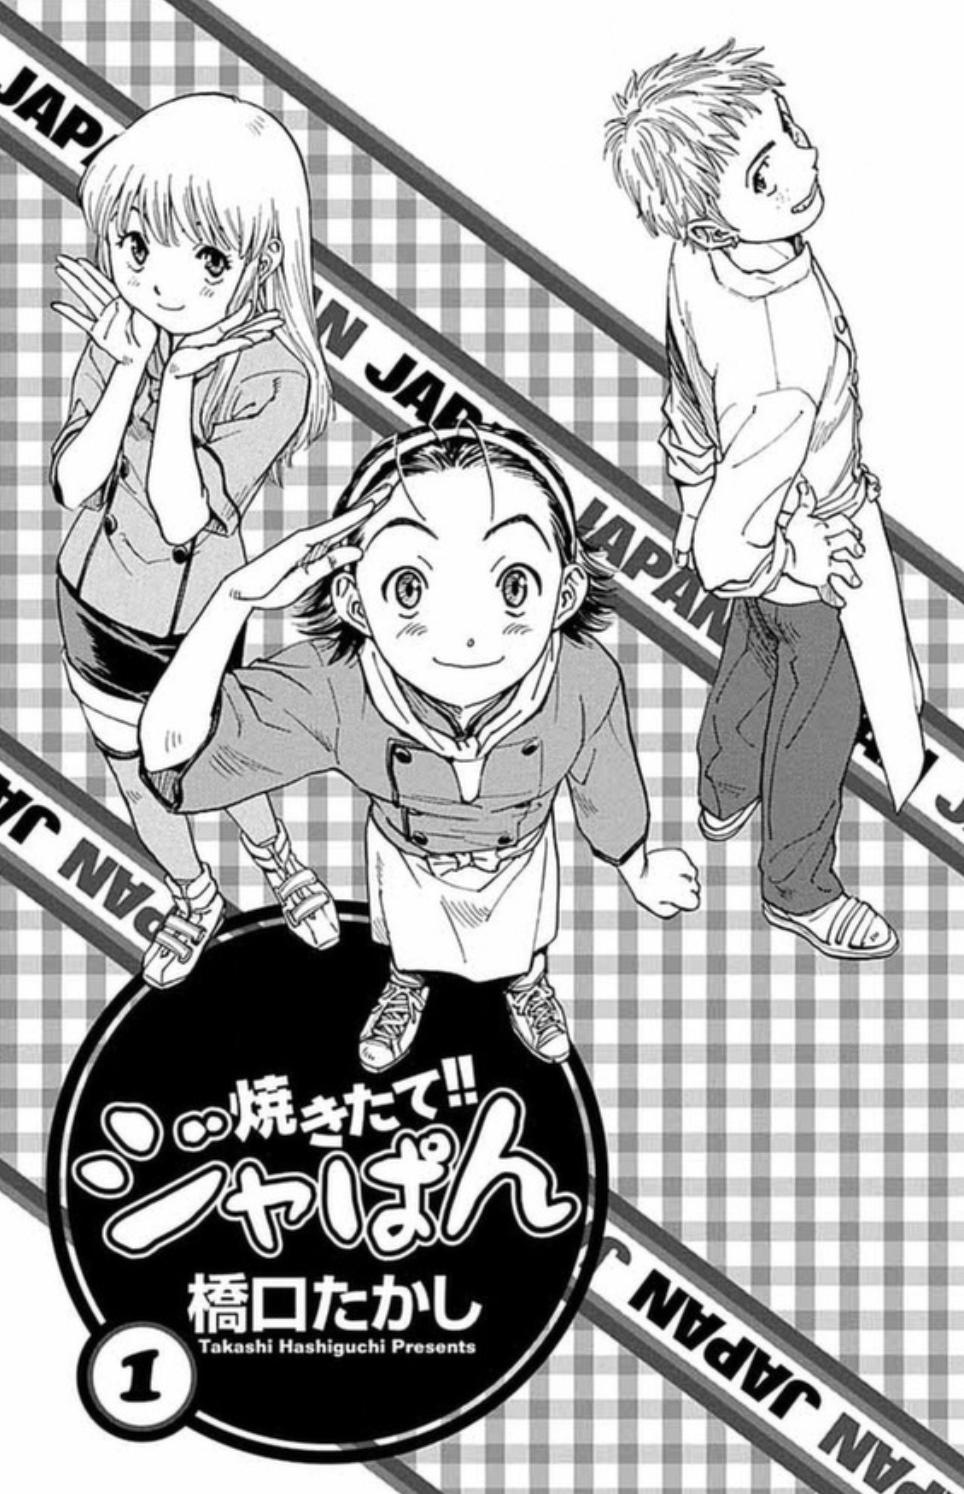 Yakitate japan manga vol 1 japanese thumbnail 1